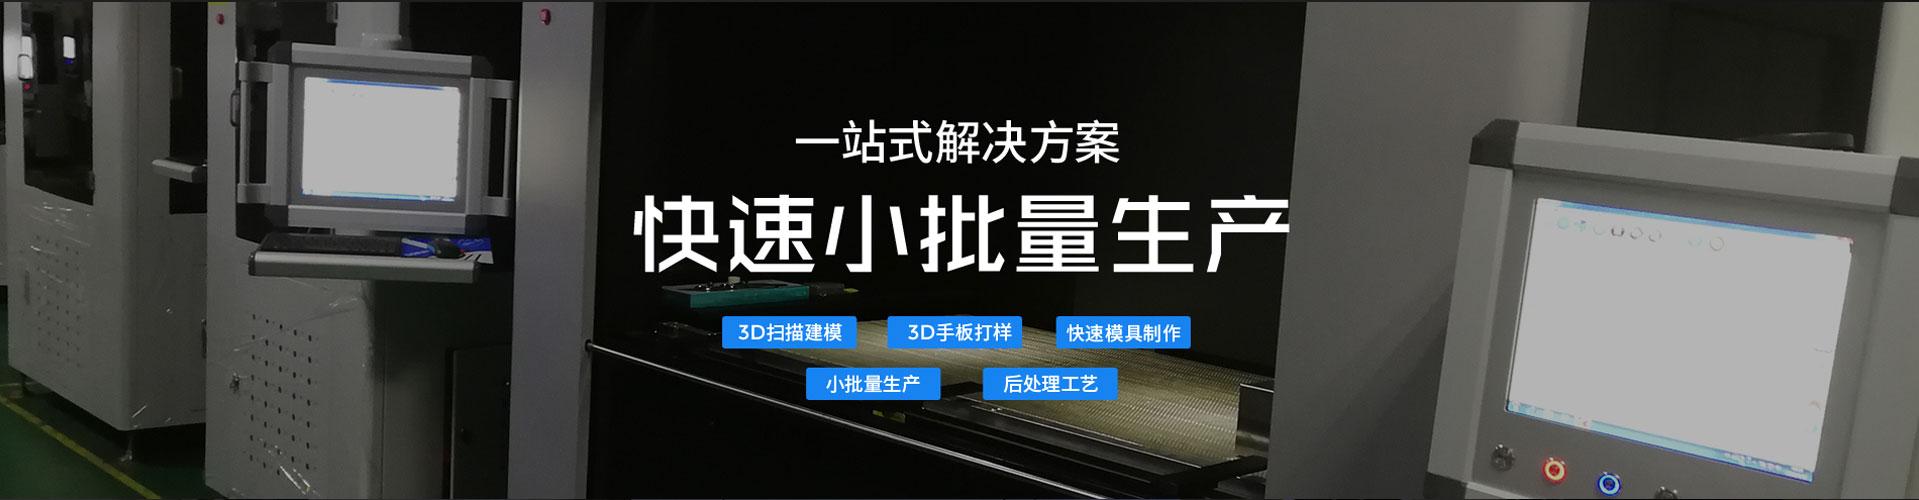 3D打印柔性化多品种小批量生产技术